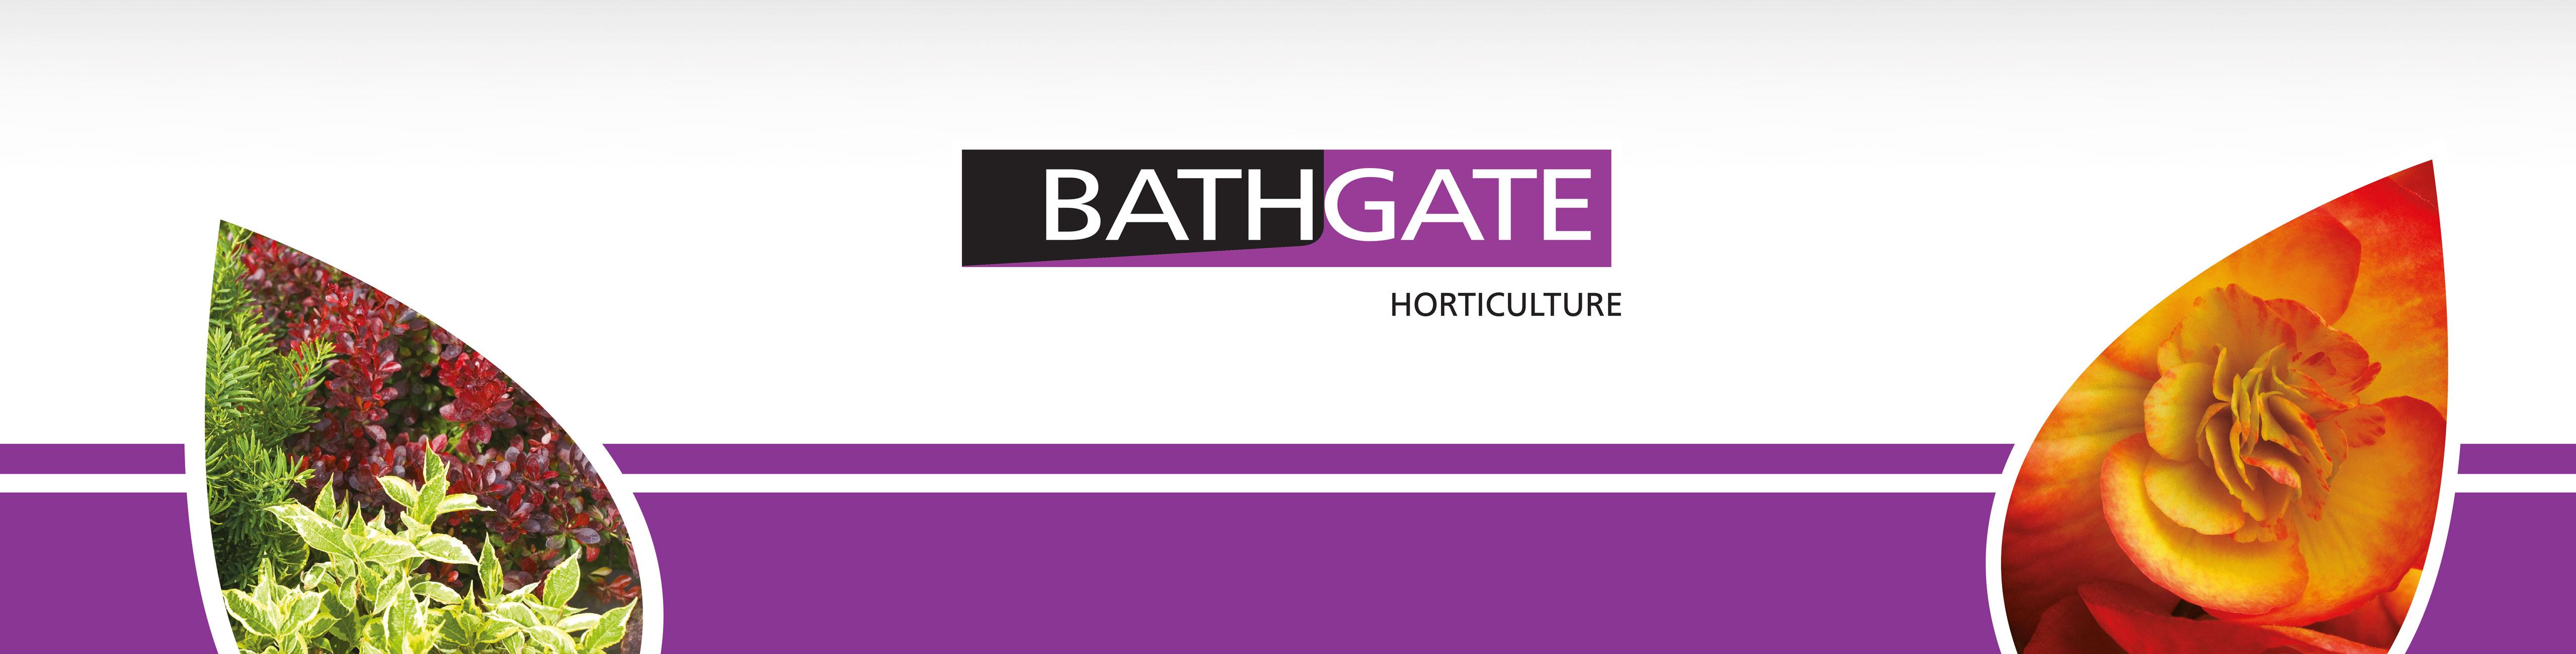 Bathgate Branding